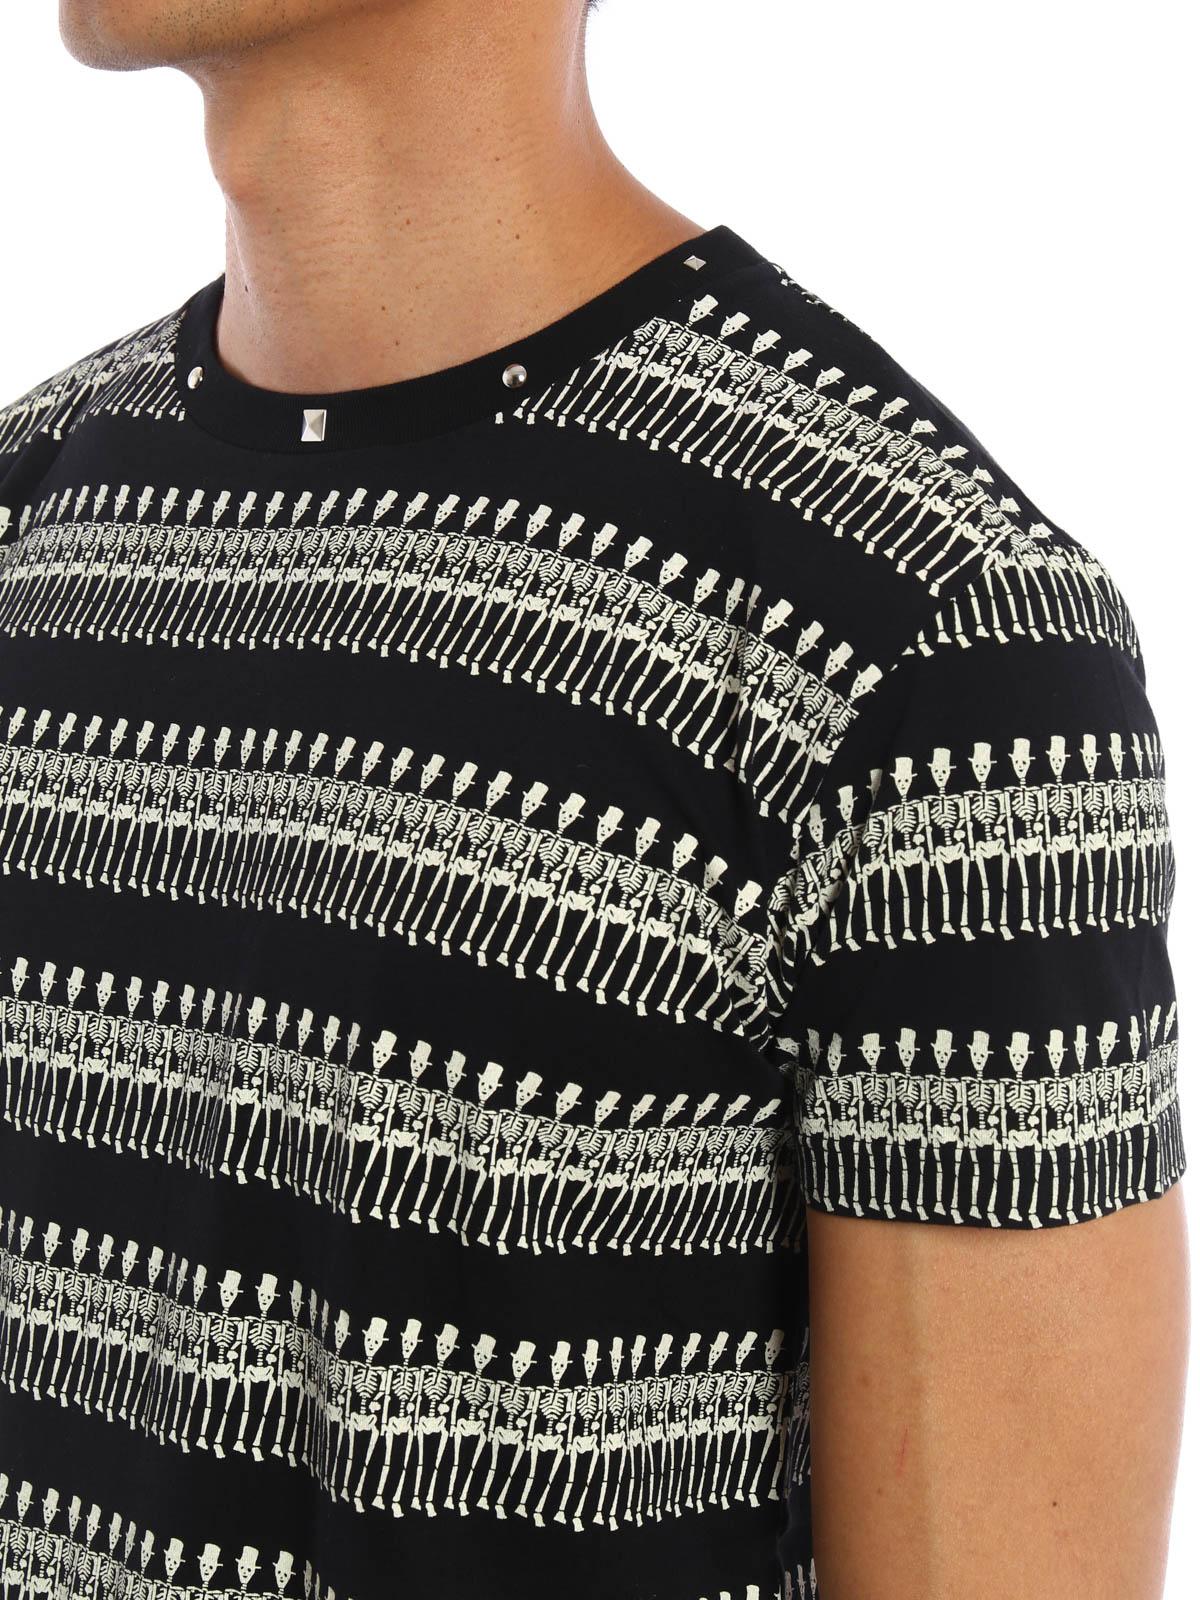 e5e42ab787 Saint Laurent - Skeleton and studs T-shirt - t-shirts - 436307YB1CF1058